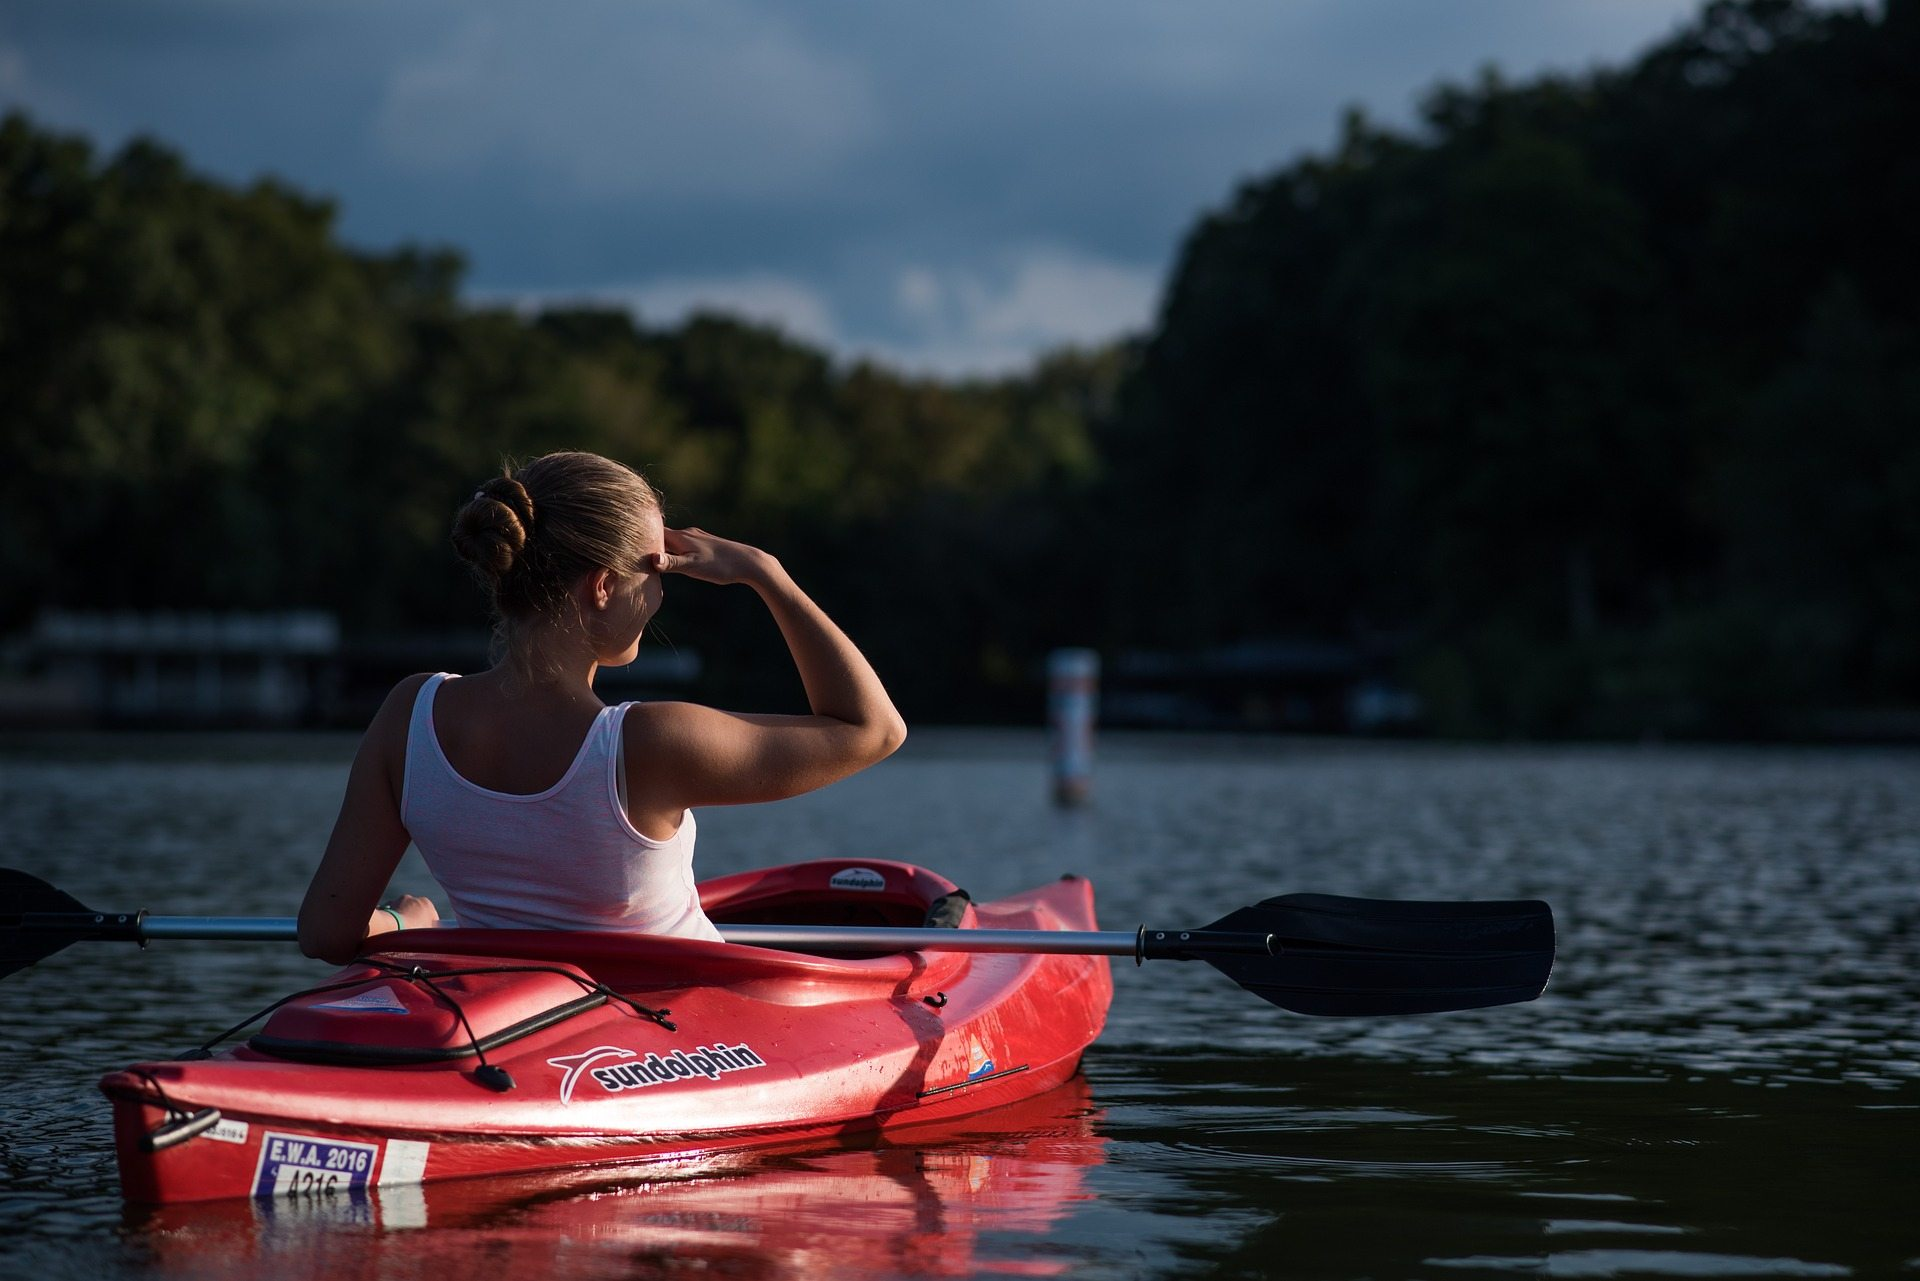 Chica canoa